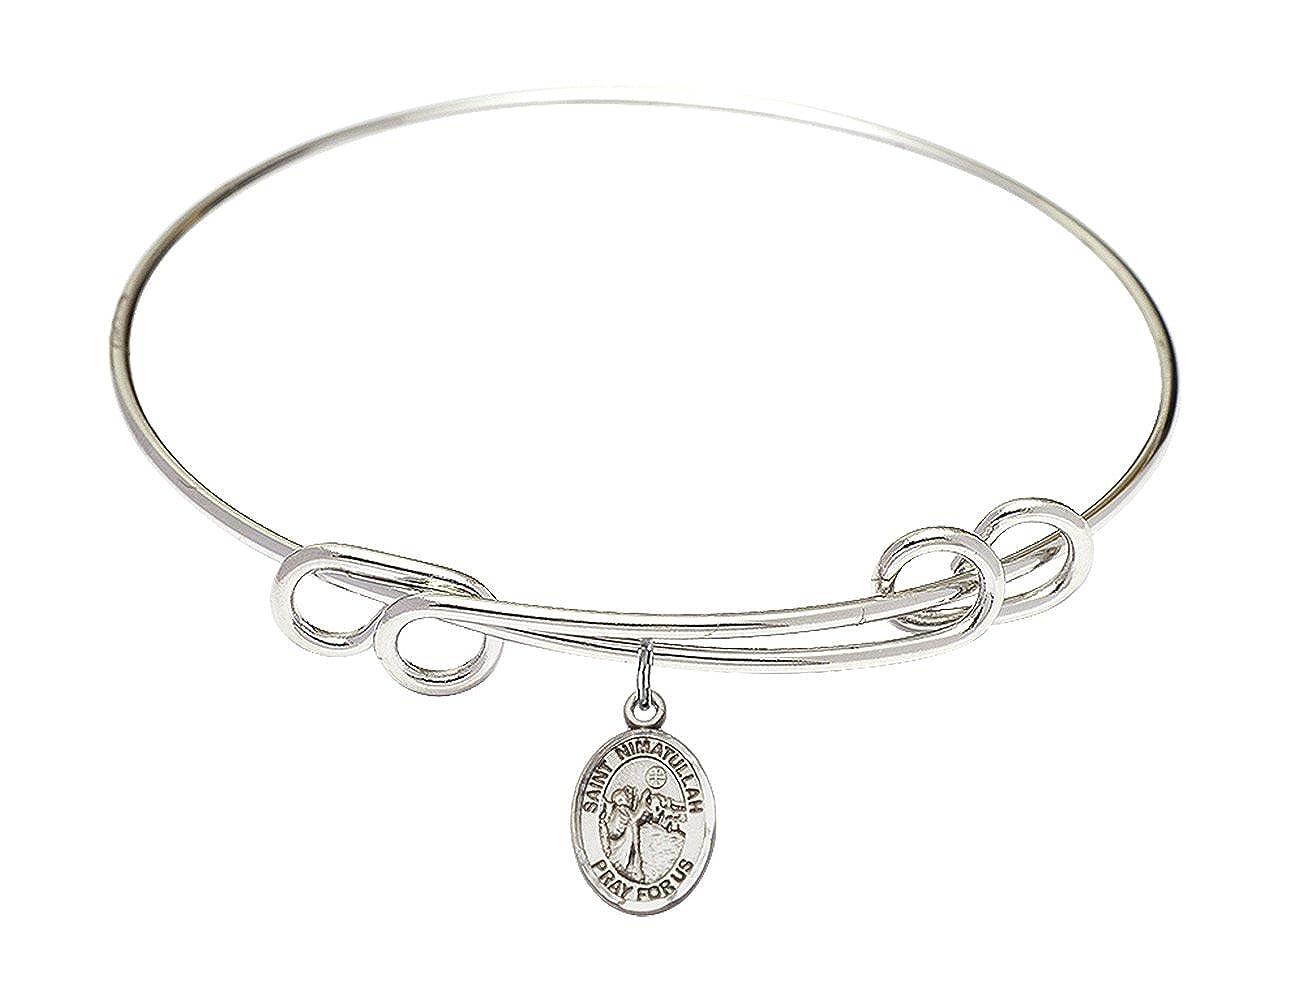 Bonyak Jewelry Round Double Loop Bangle Bracelet w//St Nimatullah in Sterling Silver